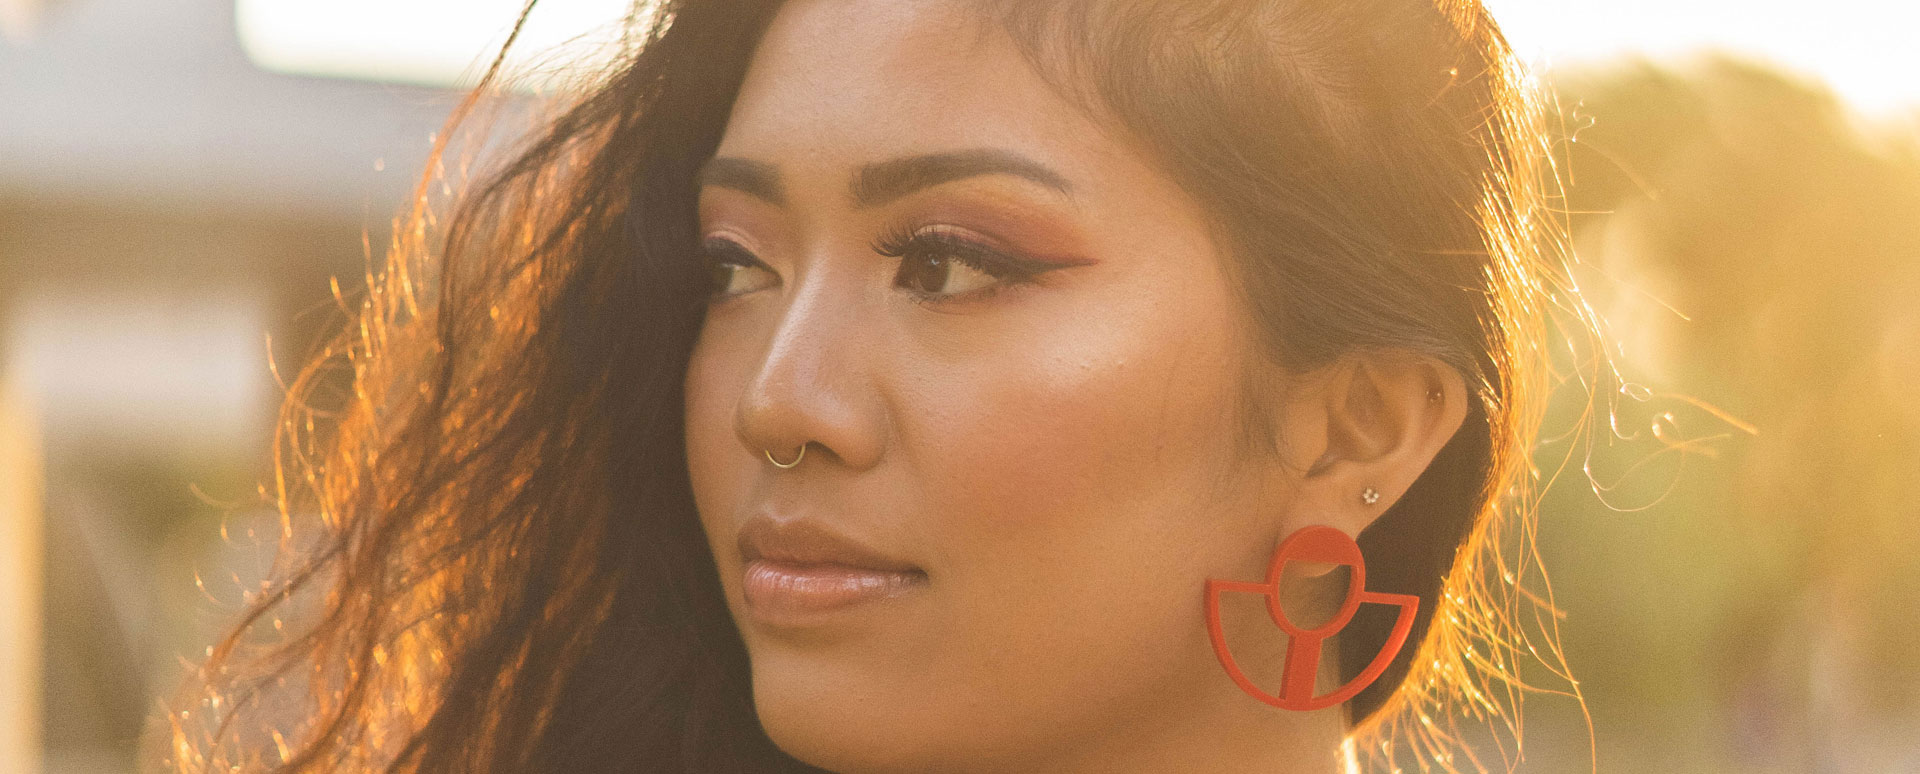 BRWNGRLZ-Bayani-art-Gabriela-Earrings